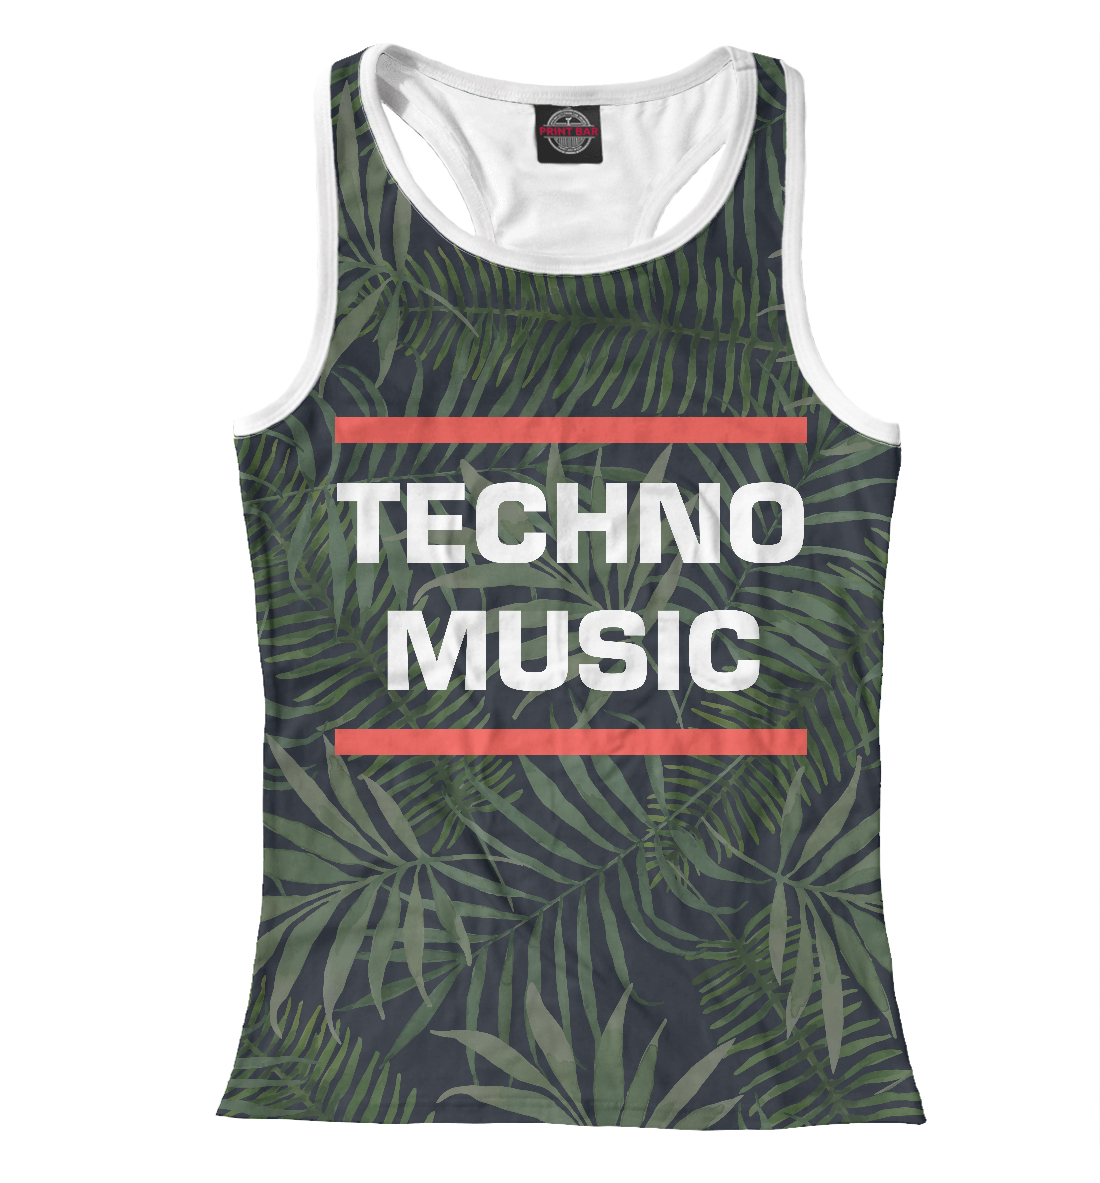 Купить Techno music, Printbar, Майки борцовки, DJS-313981-mayb-1